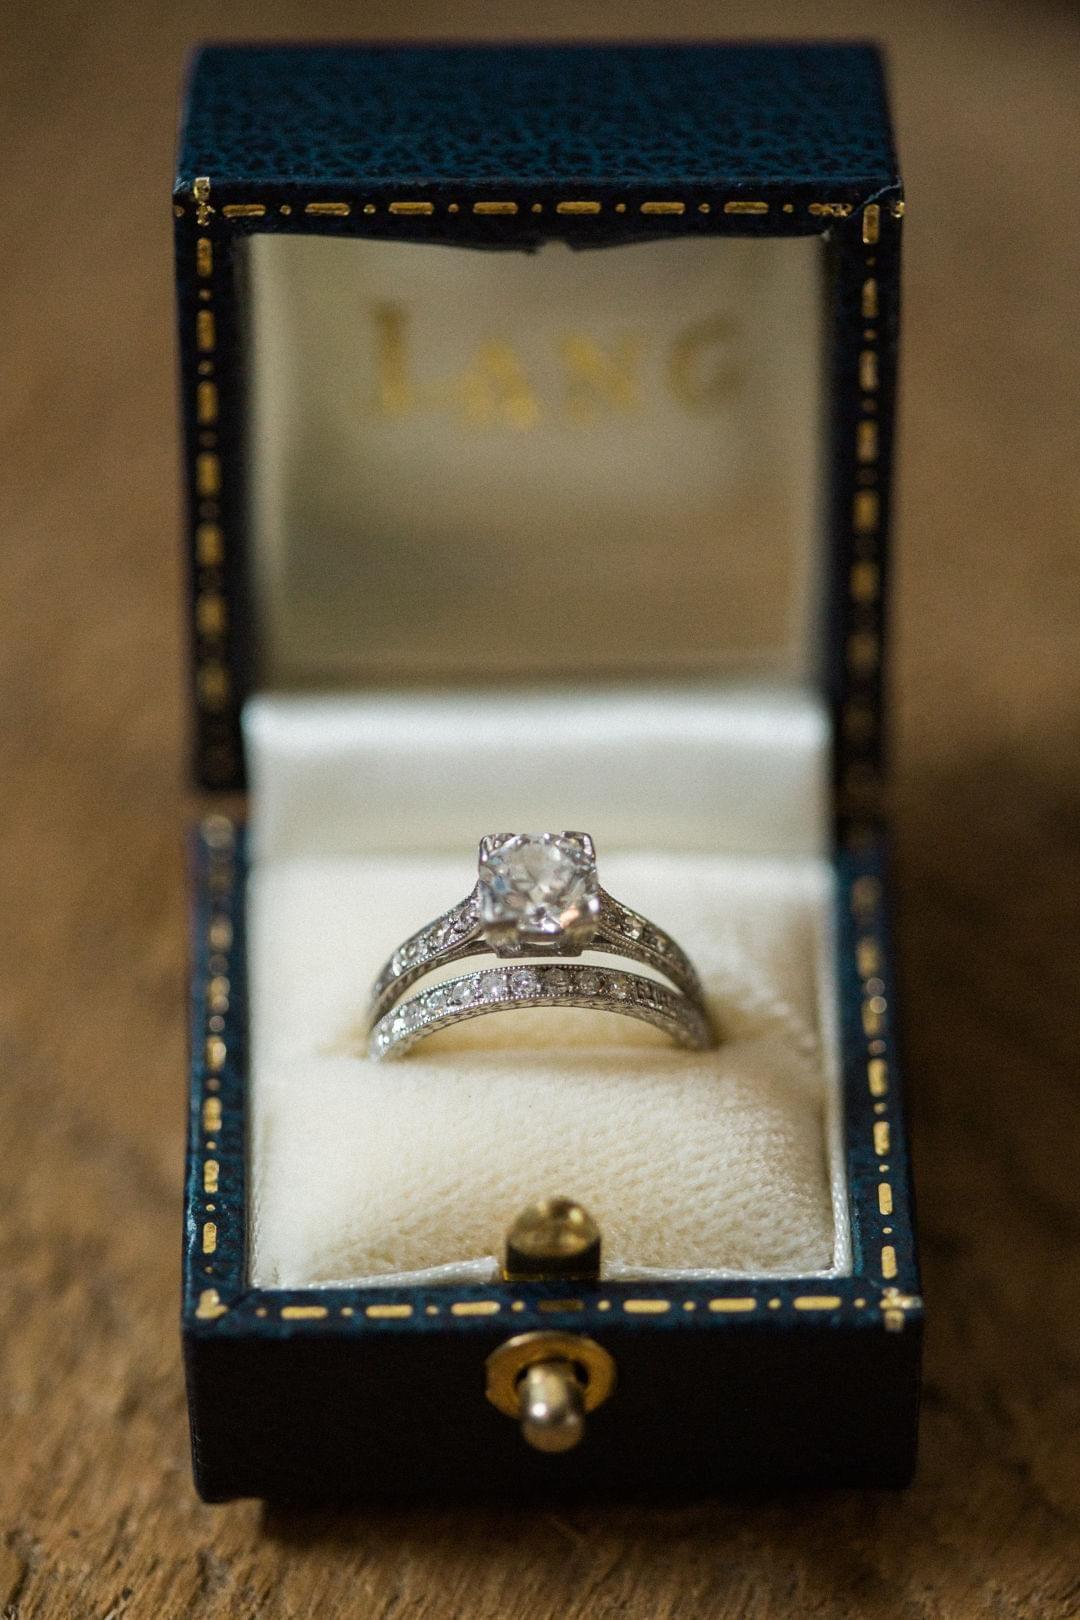 Engagement ring, wedding band, engraved band, princess cut diamond ...